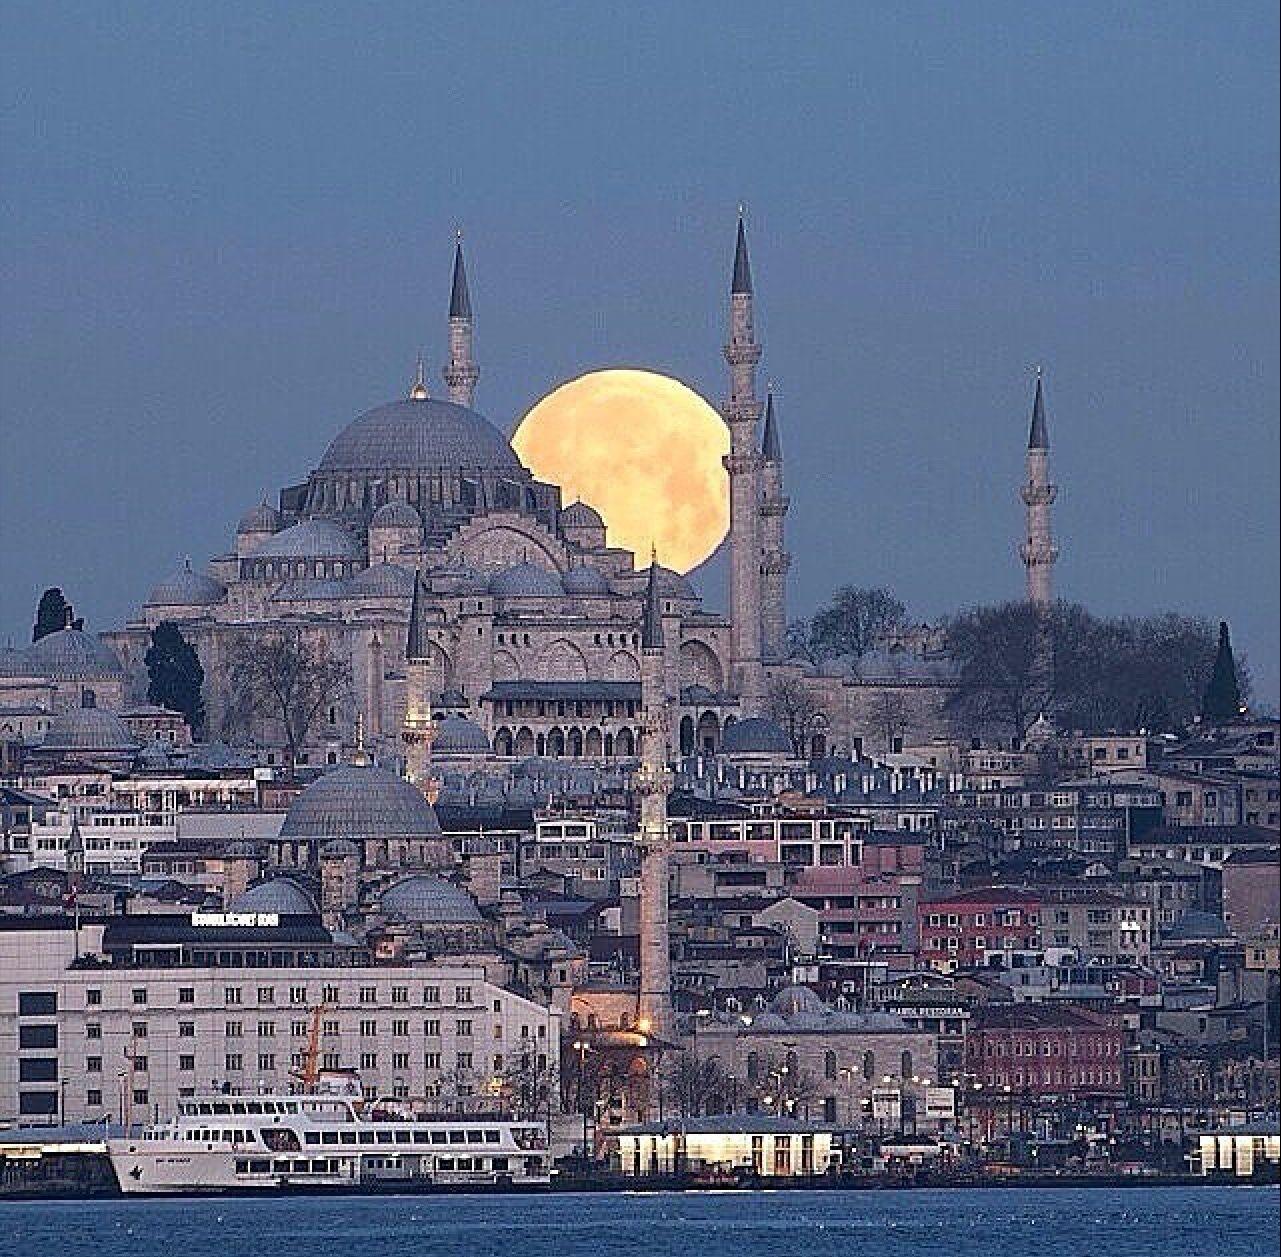 Plateia.co #CreatividadsinLimites #PlateiaColombia #foto #pic #arte #art #artista #artist Istanbul,Turkey +